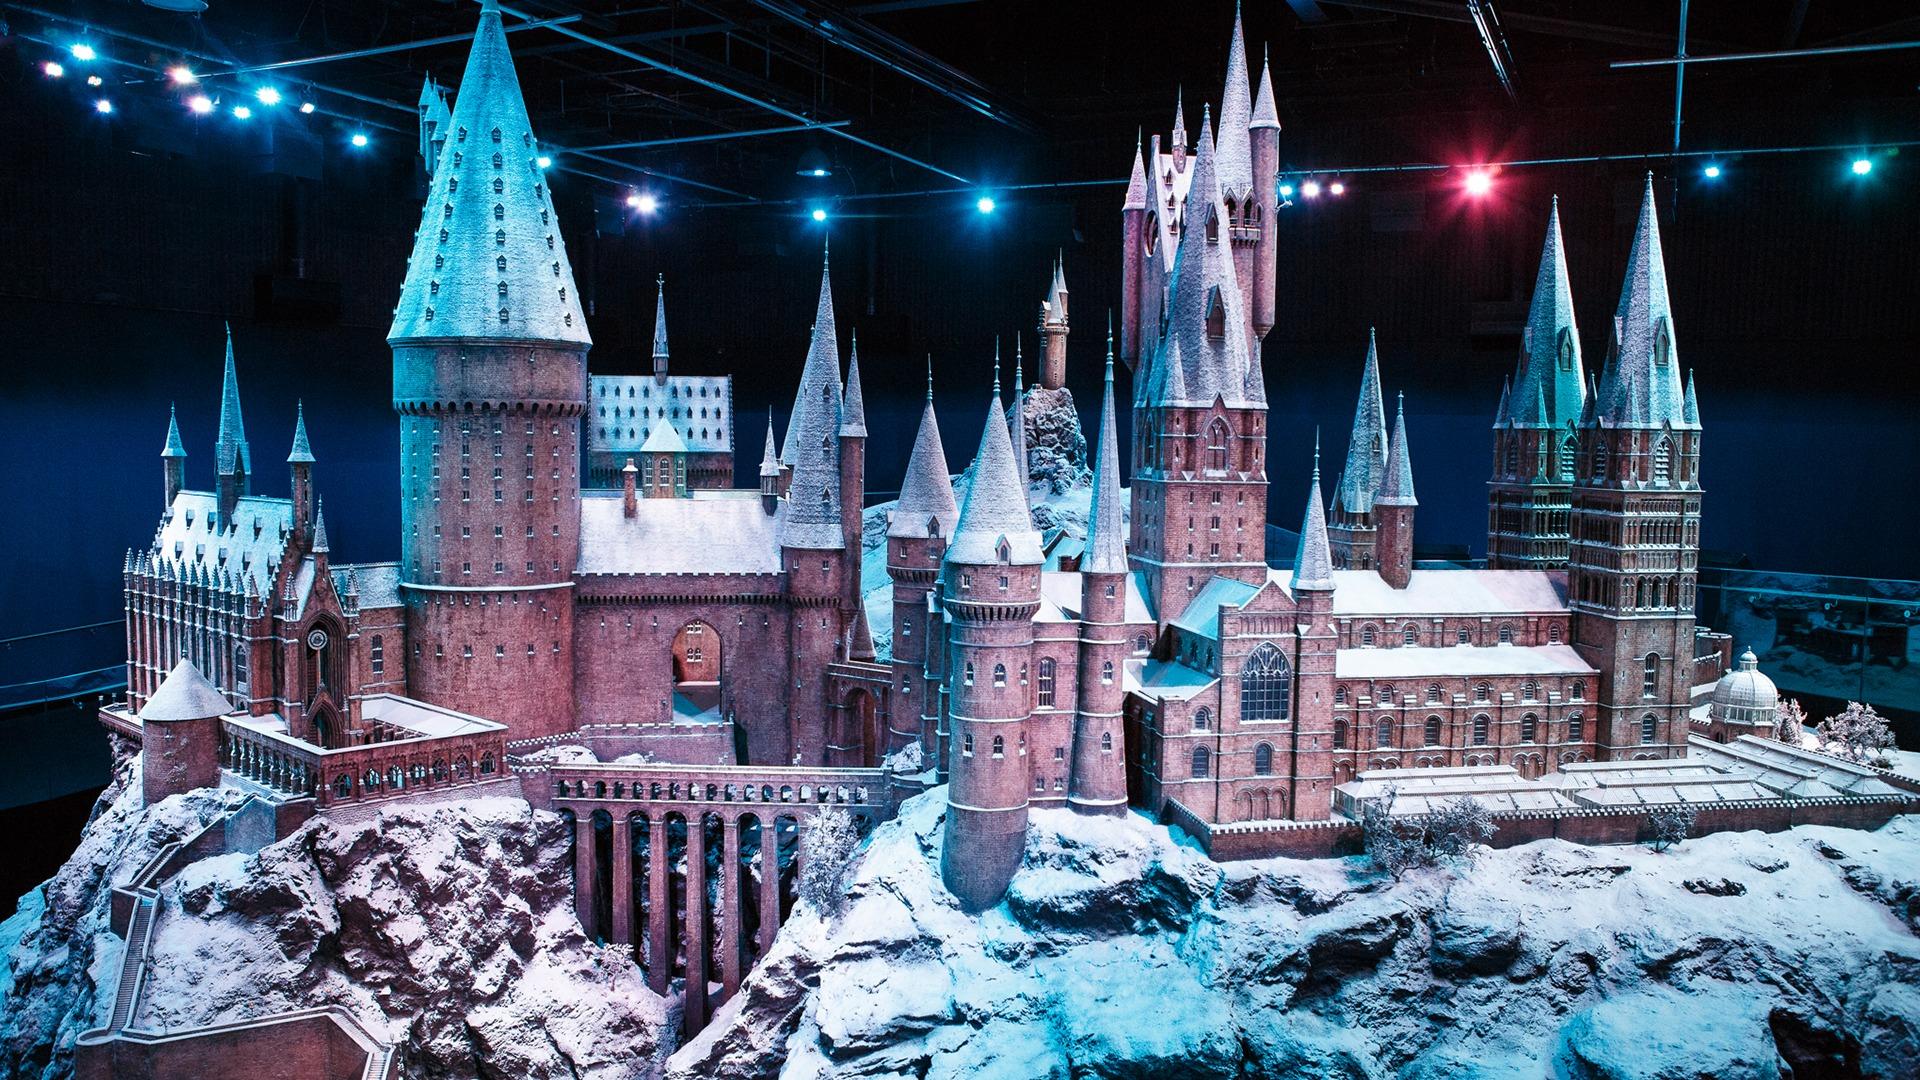 Video call background - Festive Hogwarts Castle